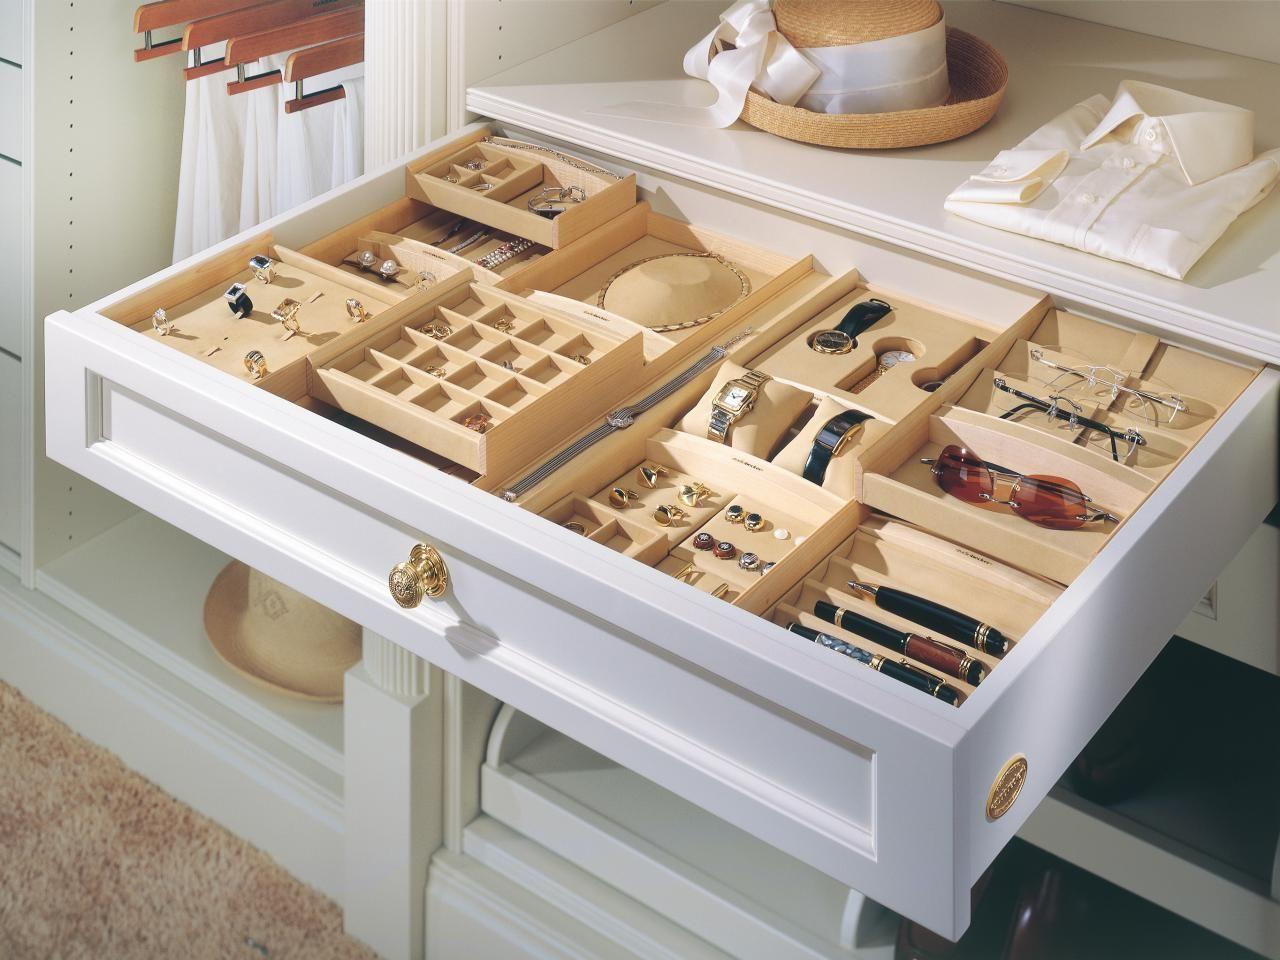 Closet Organization Accessories Ideas And Options Closet Designs Closet Design Closet Drawers